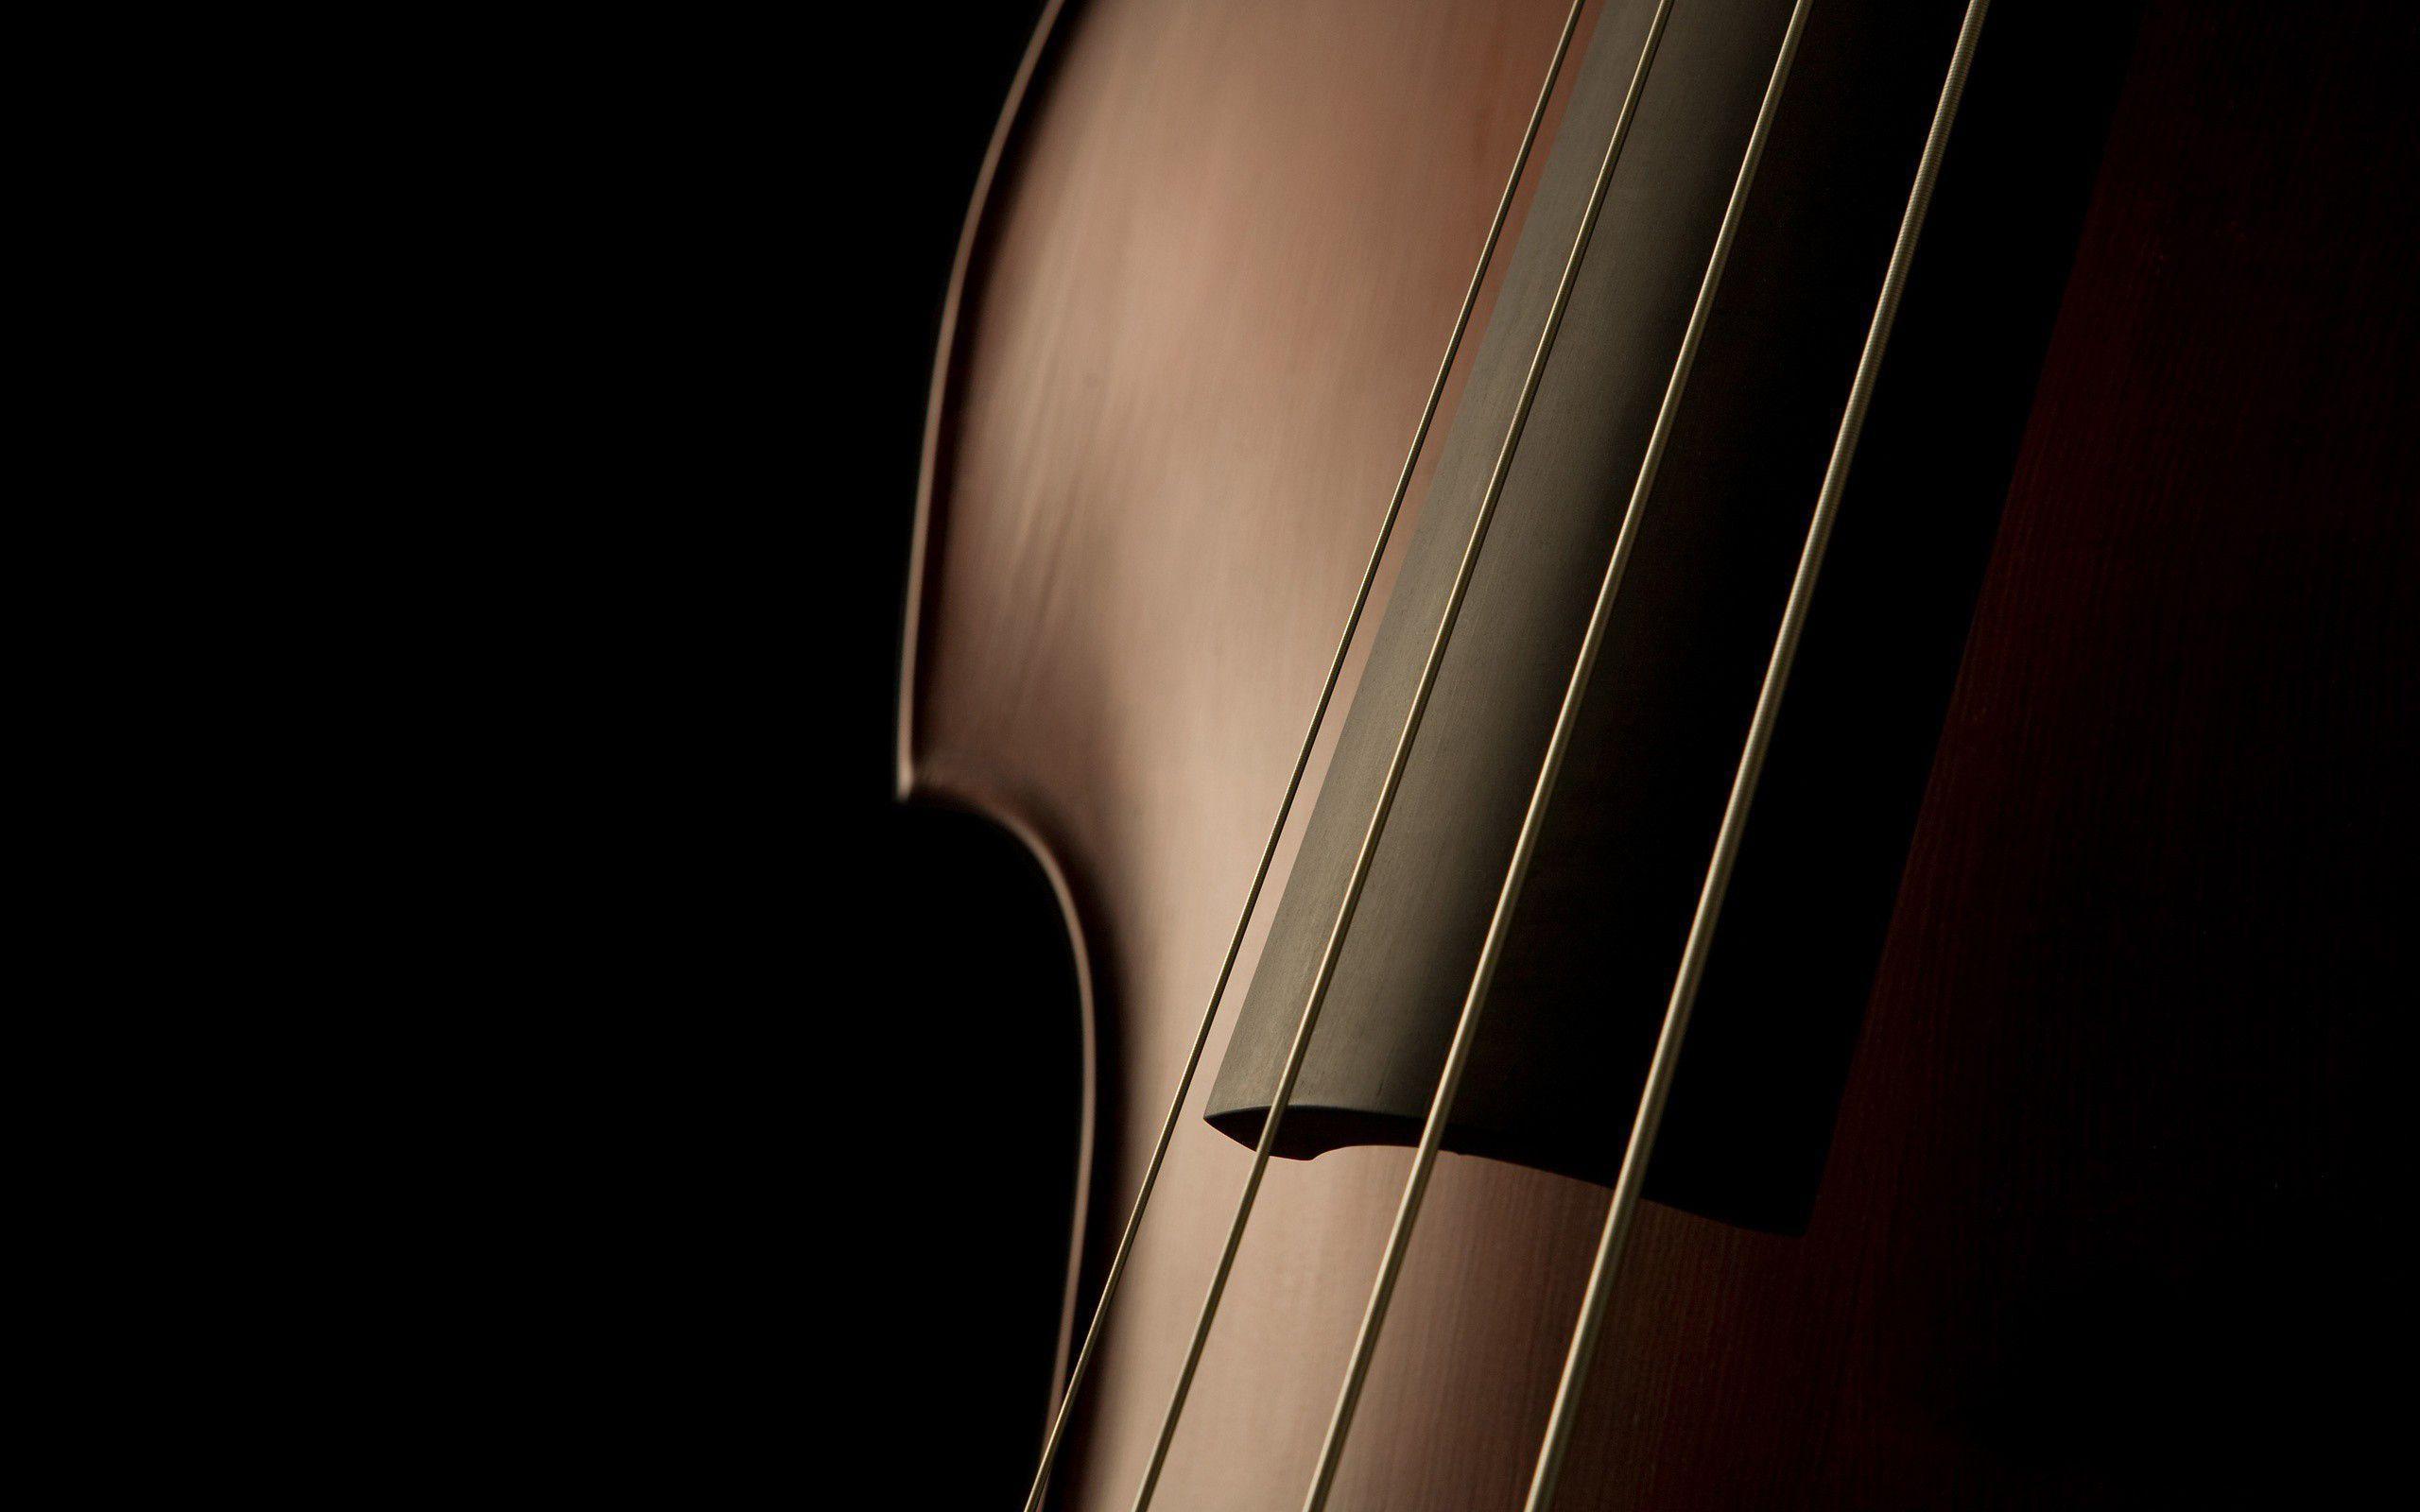 Awesome Violin Macro Wallpaper Photos 165 #3139 Wallpaper | High ...